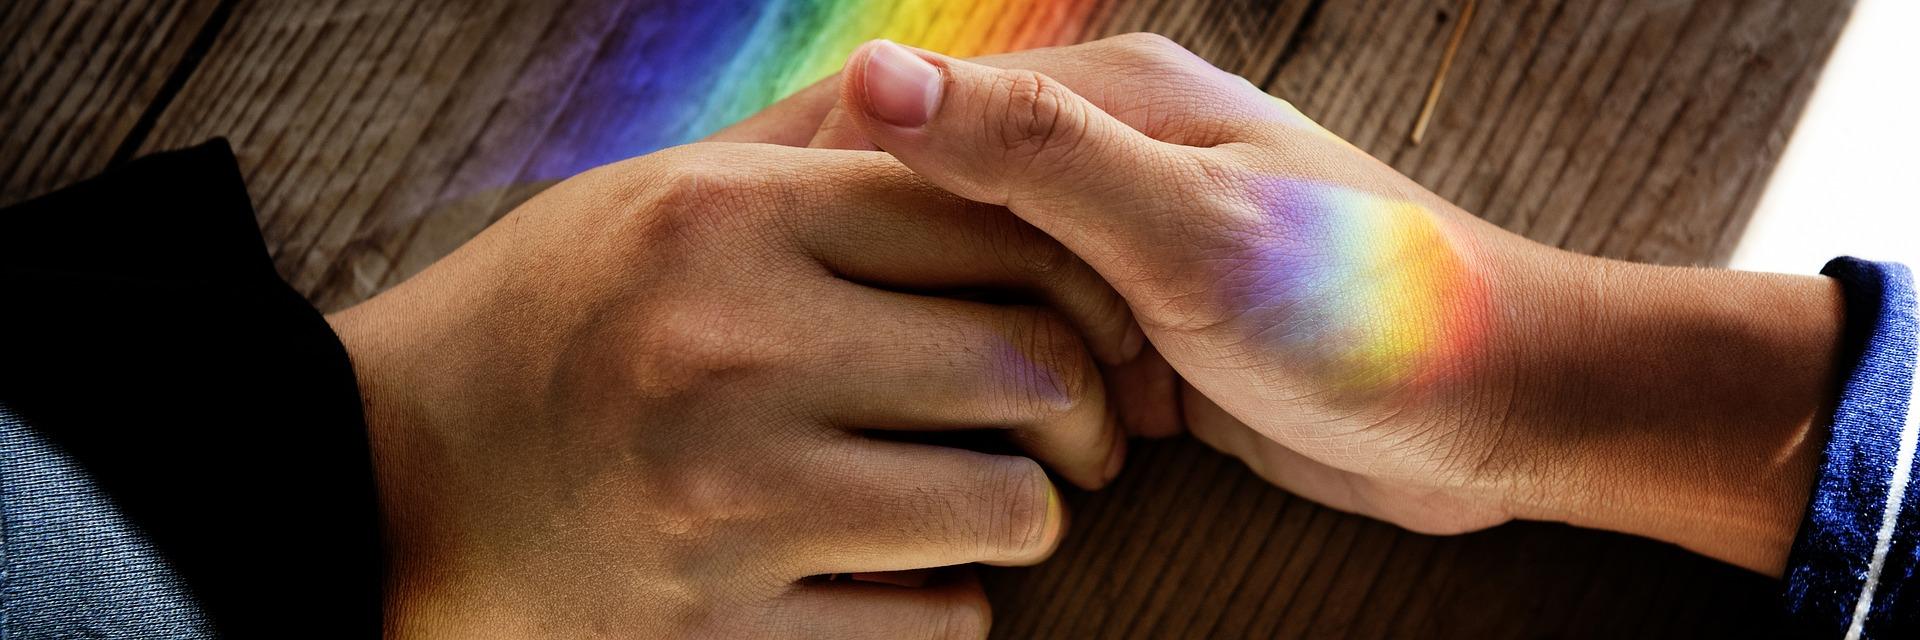 LGBTQAI pride